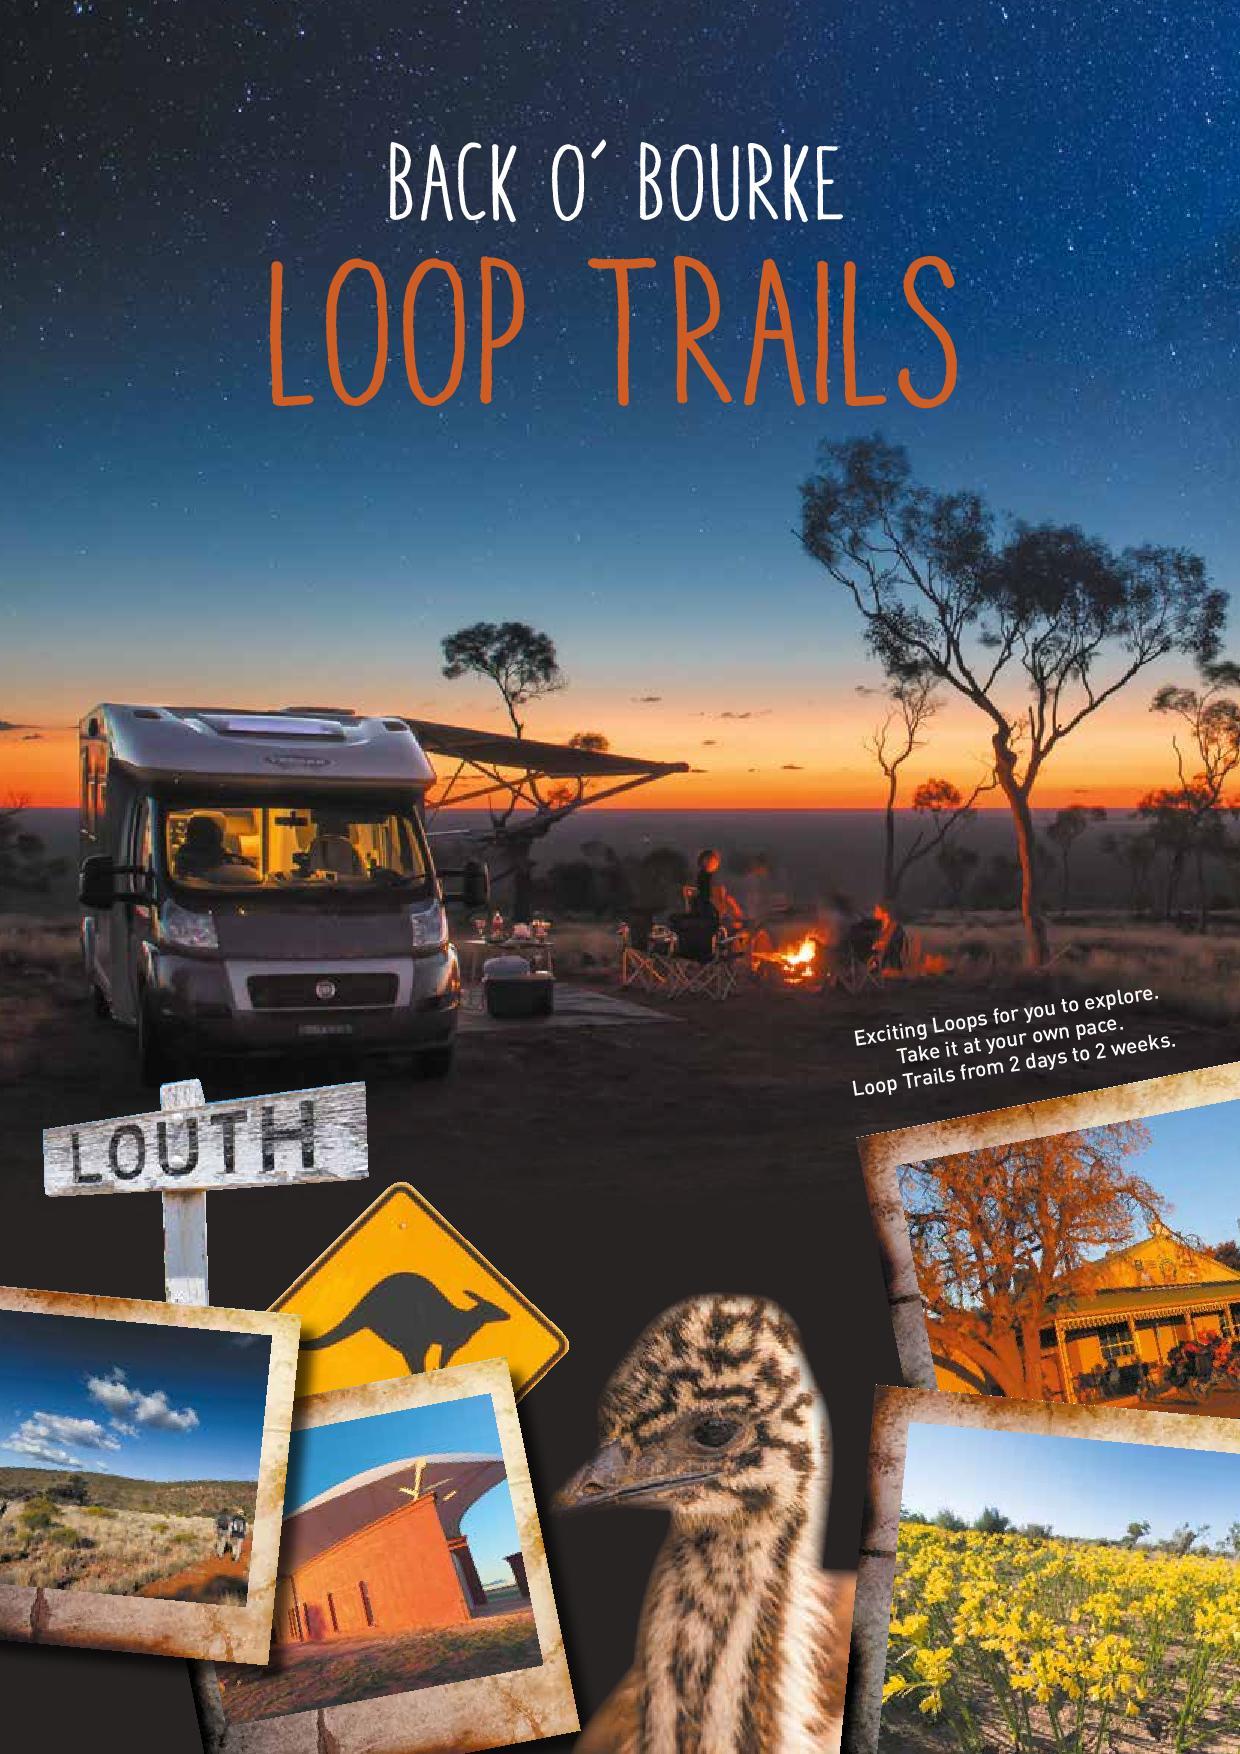 Back O Bourke Loop Trails - Local Tours - Sunshine Garden Bourke Resort